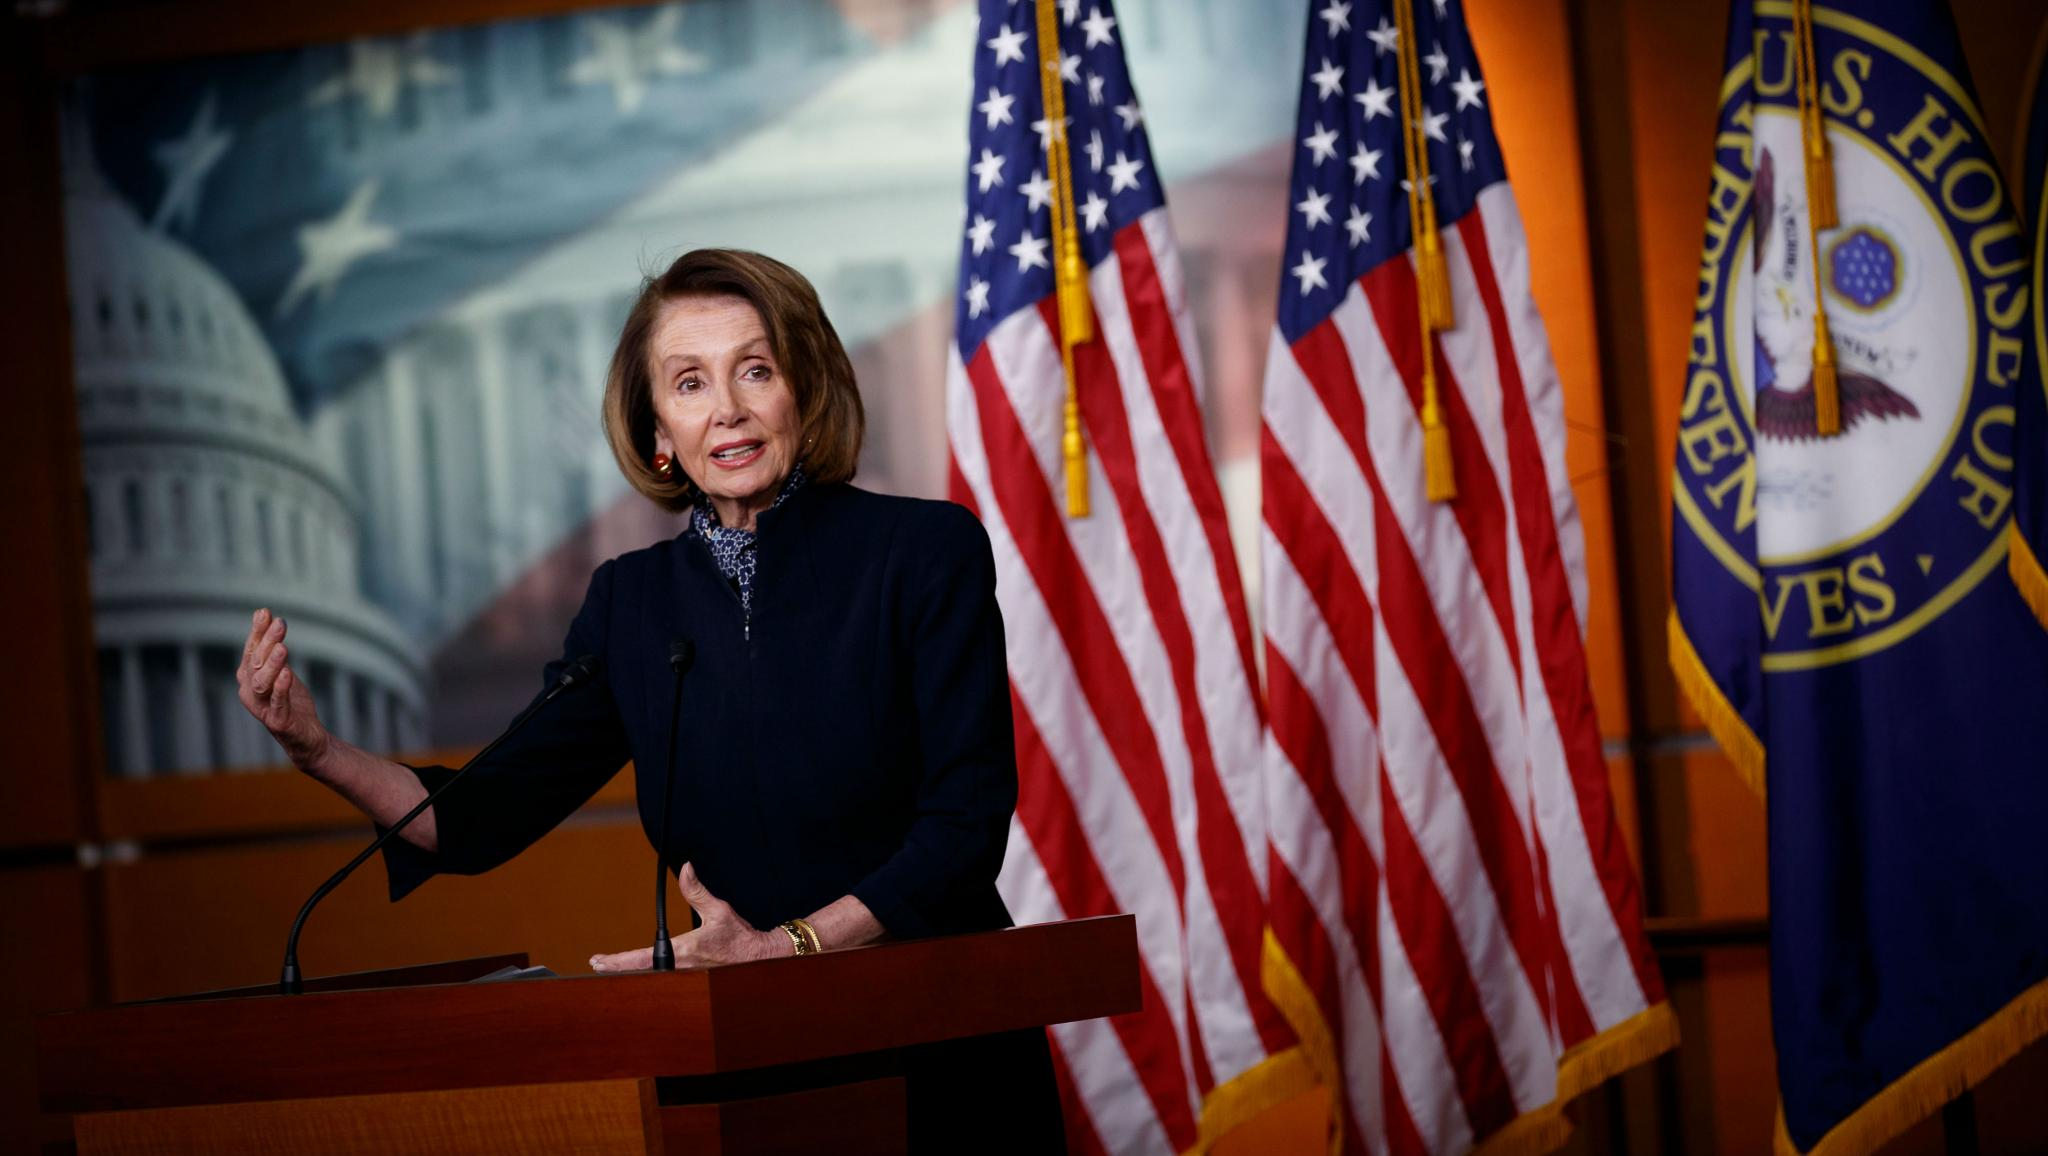 Donald Trump Impeachment Hearing: Speaker Nancy Pelosi Names Managers for Senate Impeachment Trial of US President